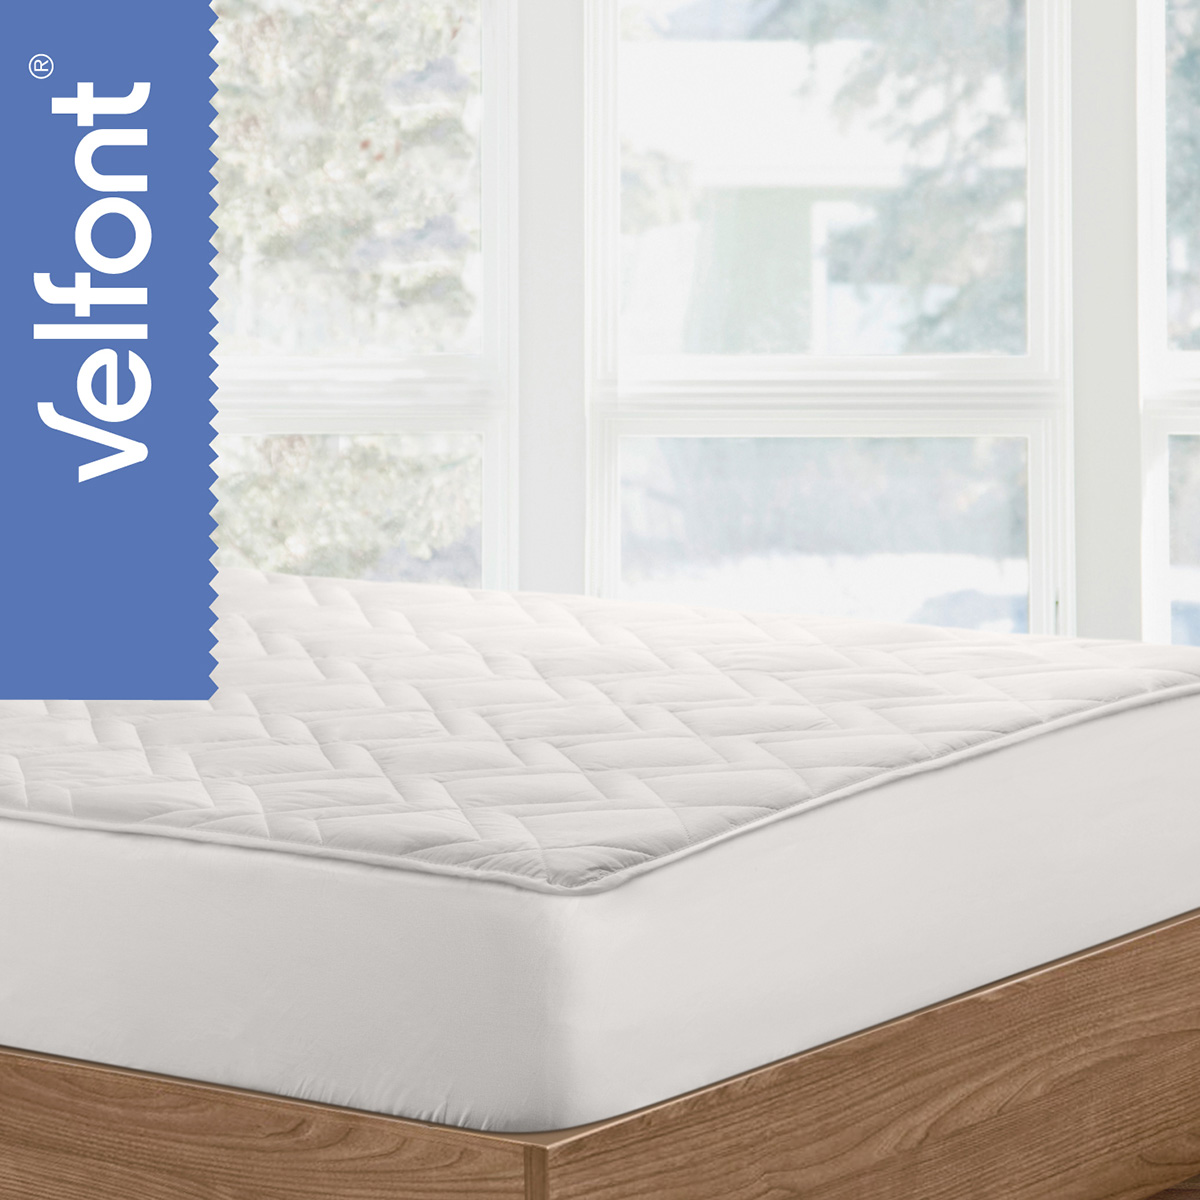 Velfont junior-rullemadras - Wool Cotton - Hvid